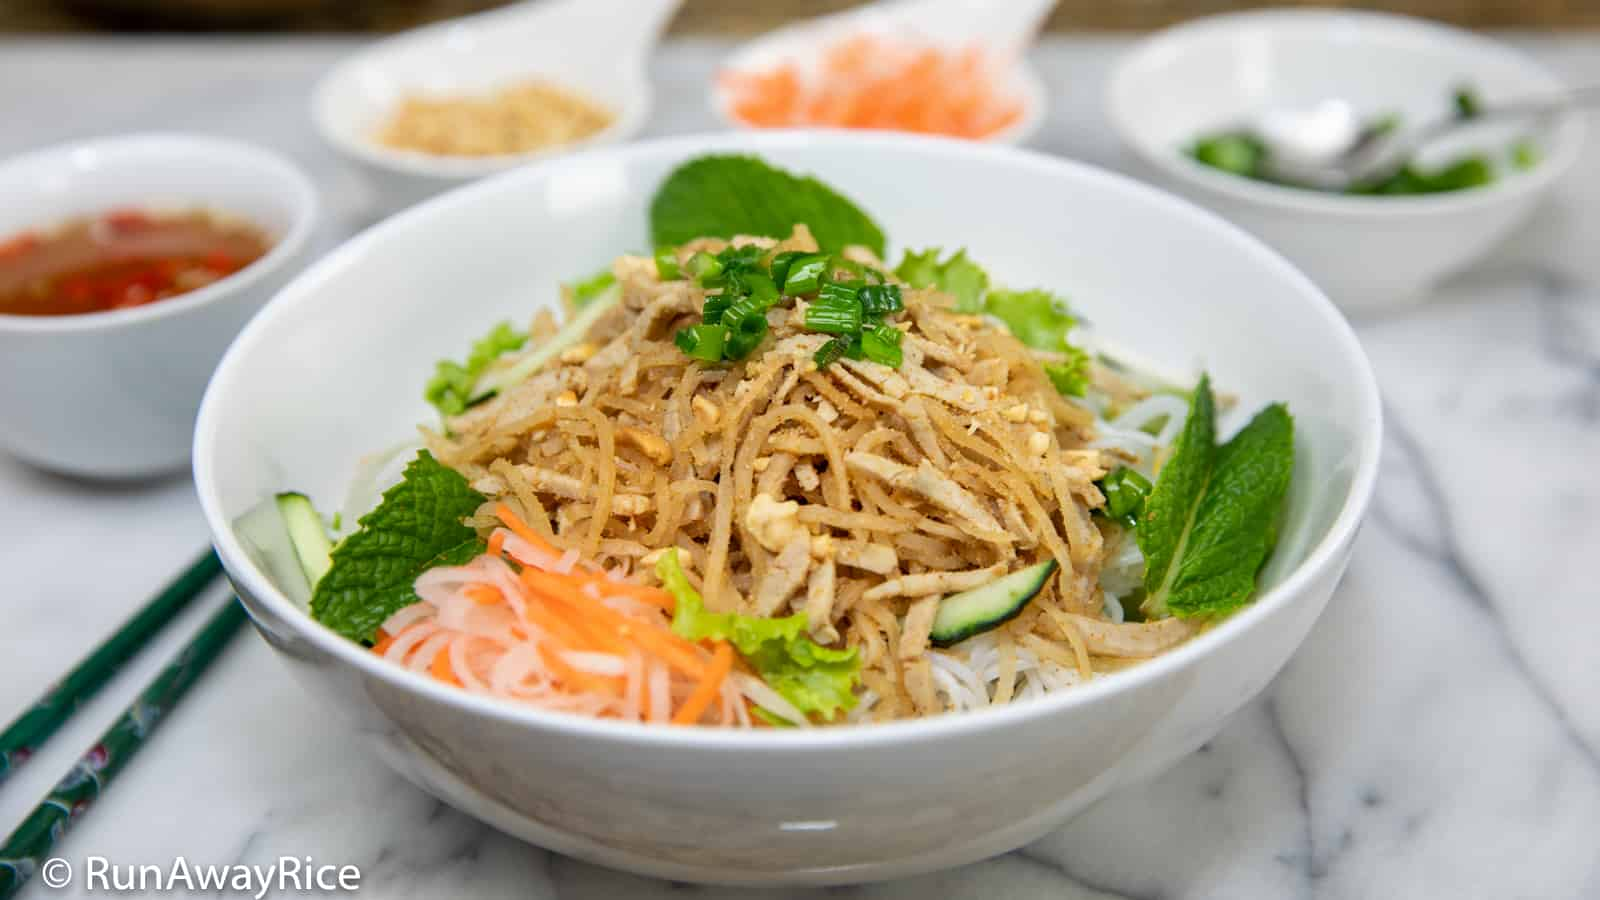 Shredded Pork Skin and Rice Vermicelli Bowl (Bun Bi) | recipe from runawayrice.com